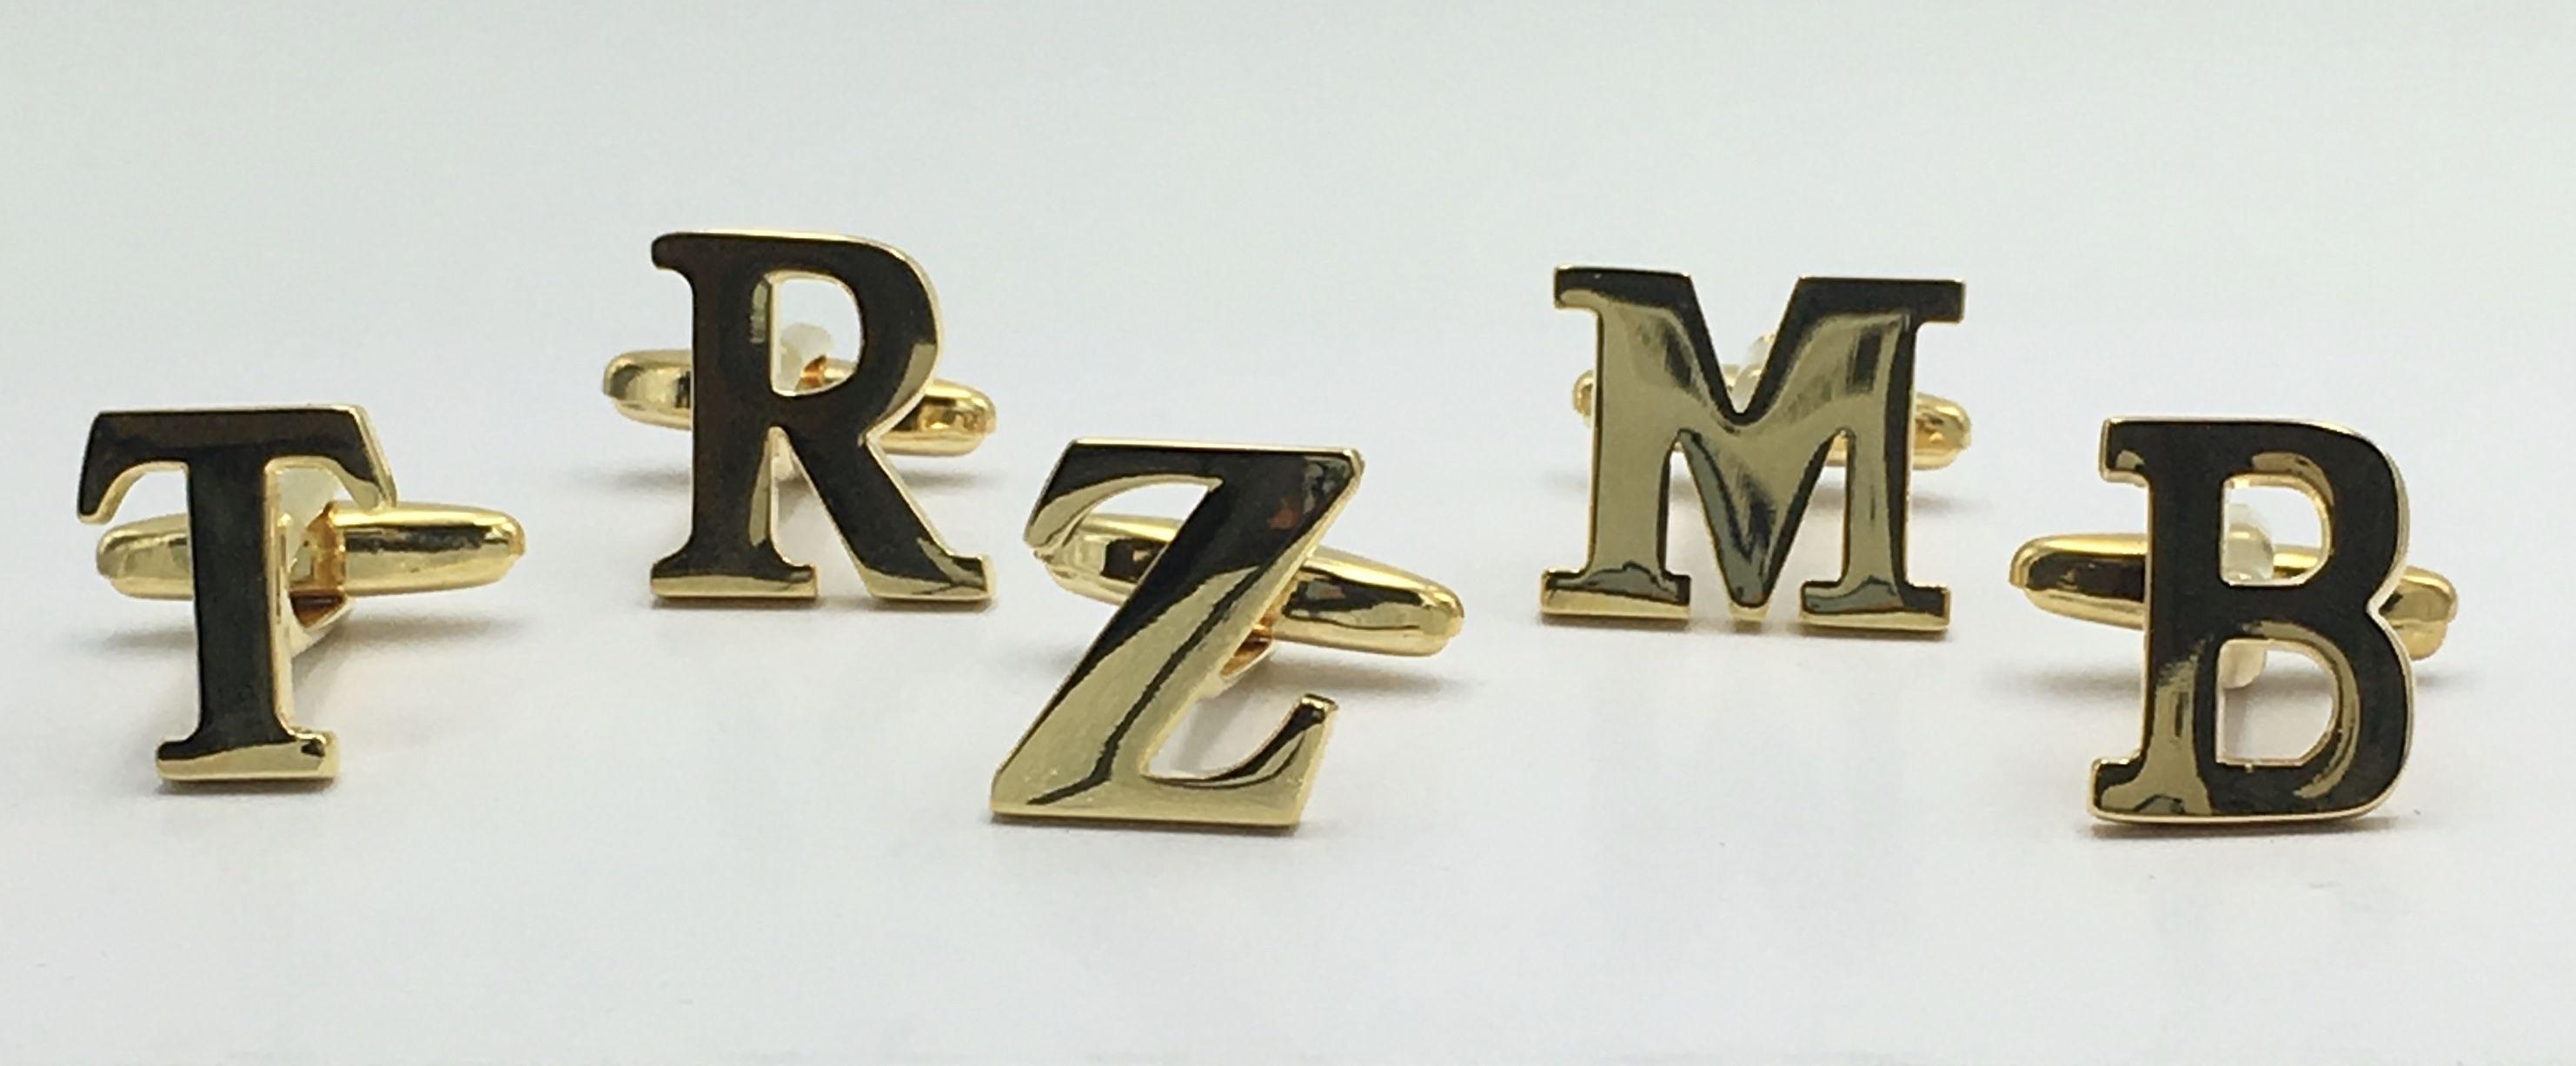 *2 Pc. Gold INITIAL Personalized Custom Cufflinks